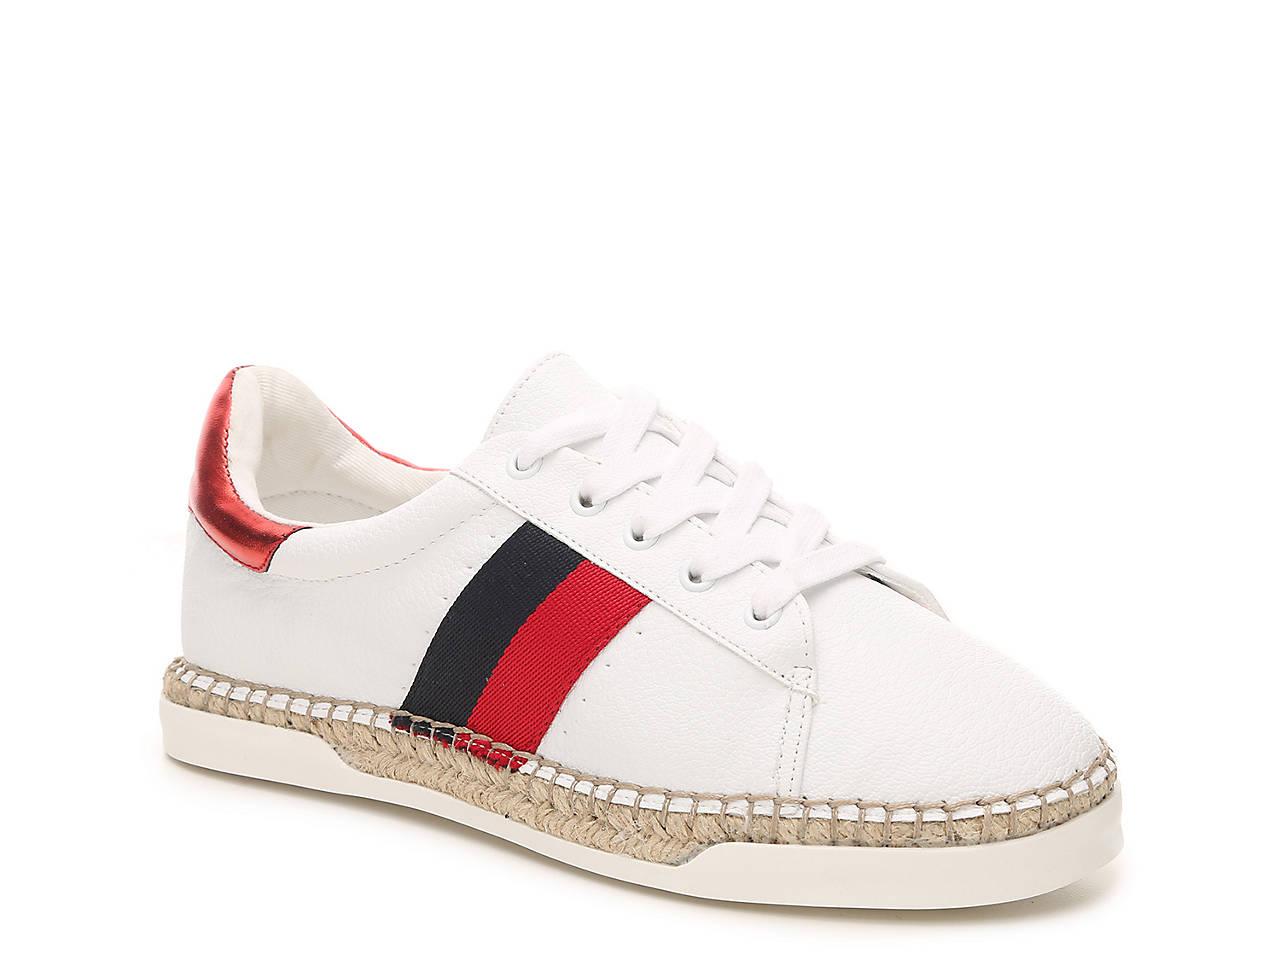 bc1d58edfe3 Steve Madden Lex Espadrille Sneaker Women s Shoes